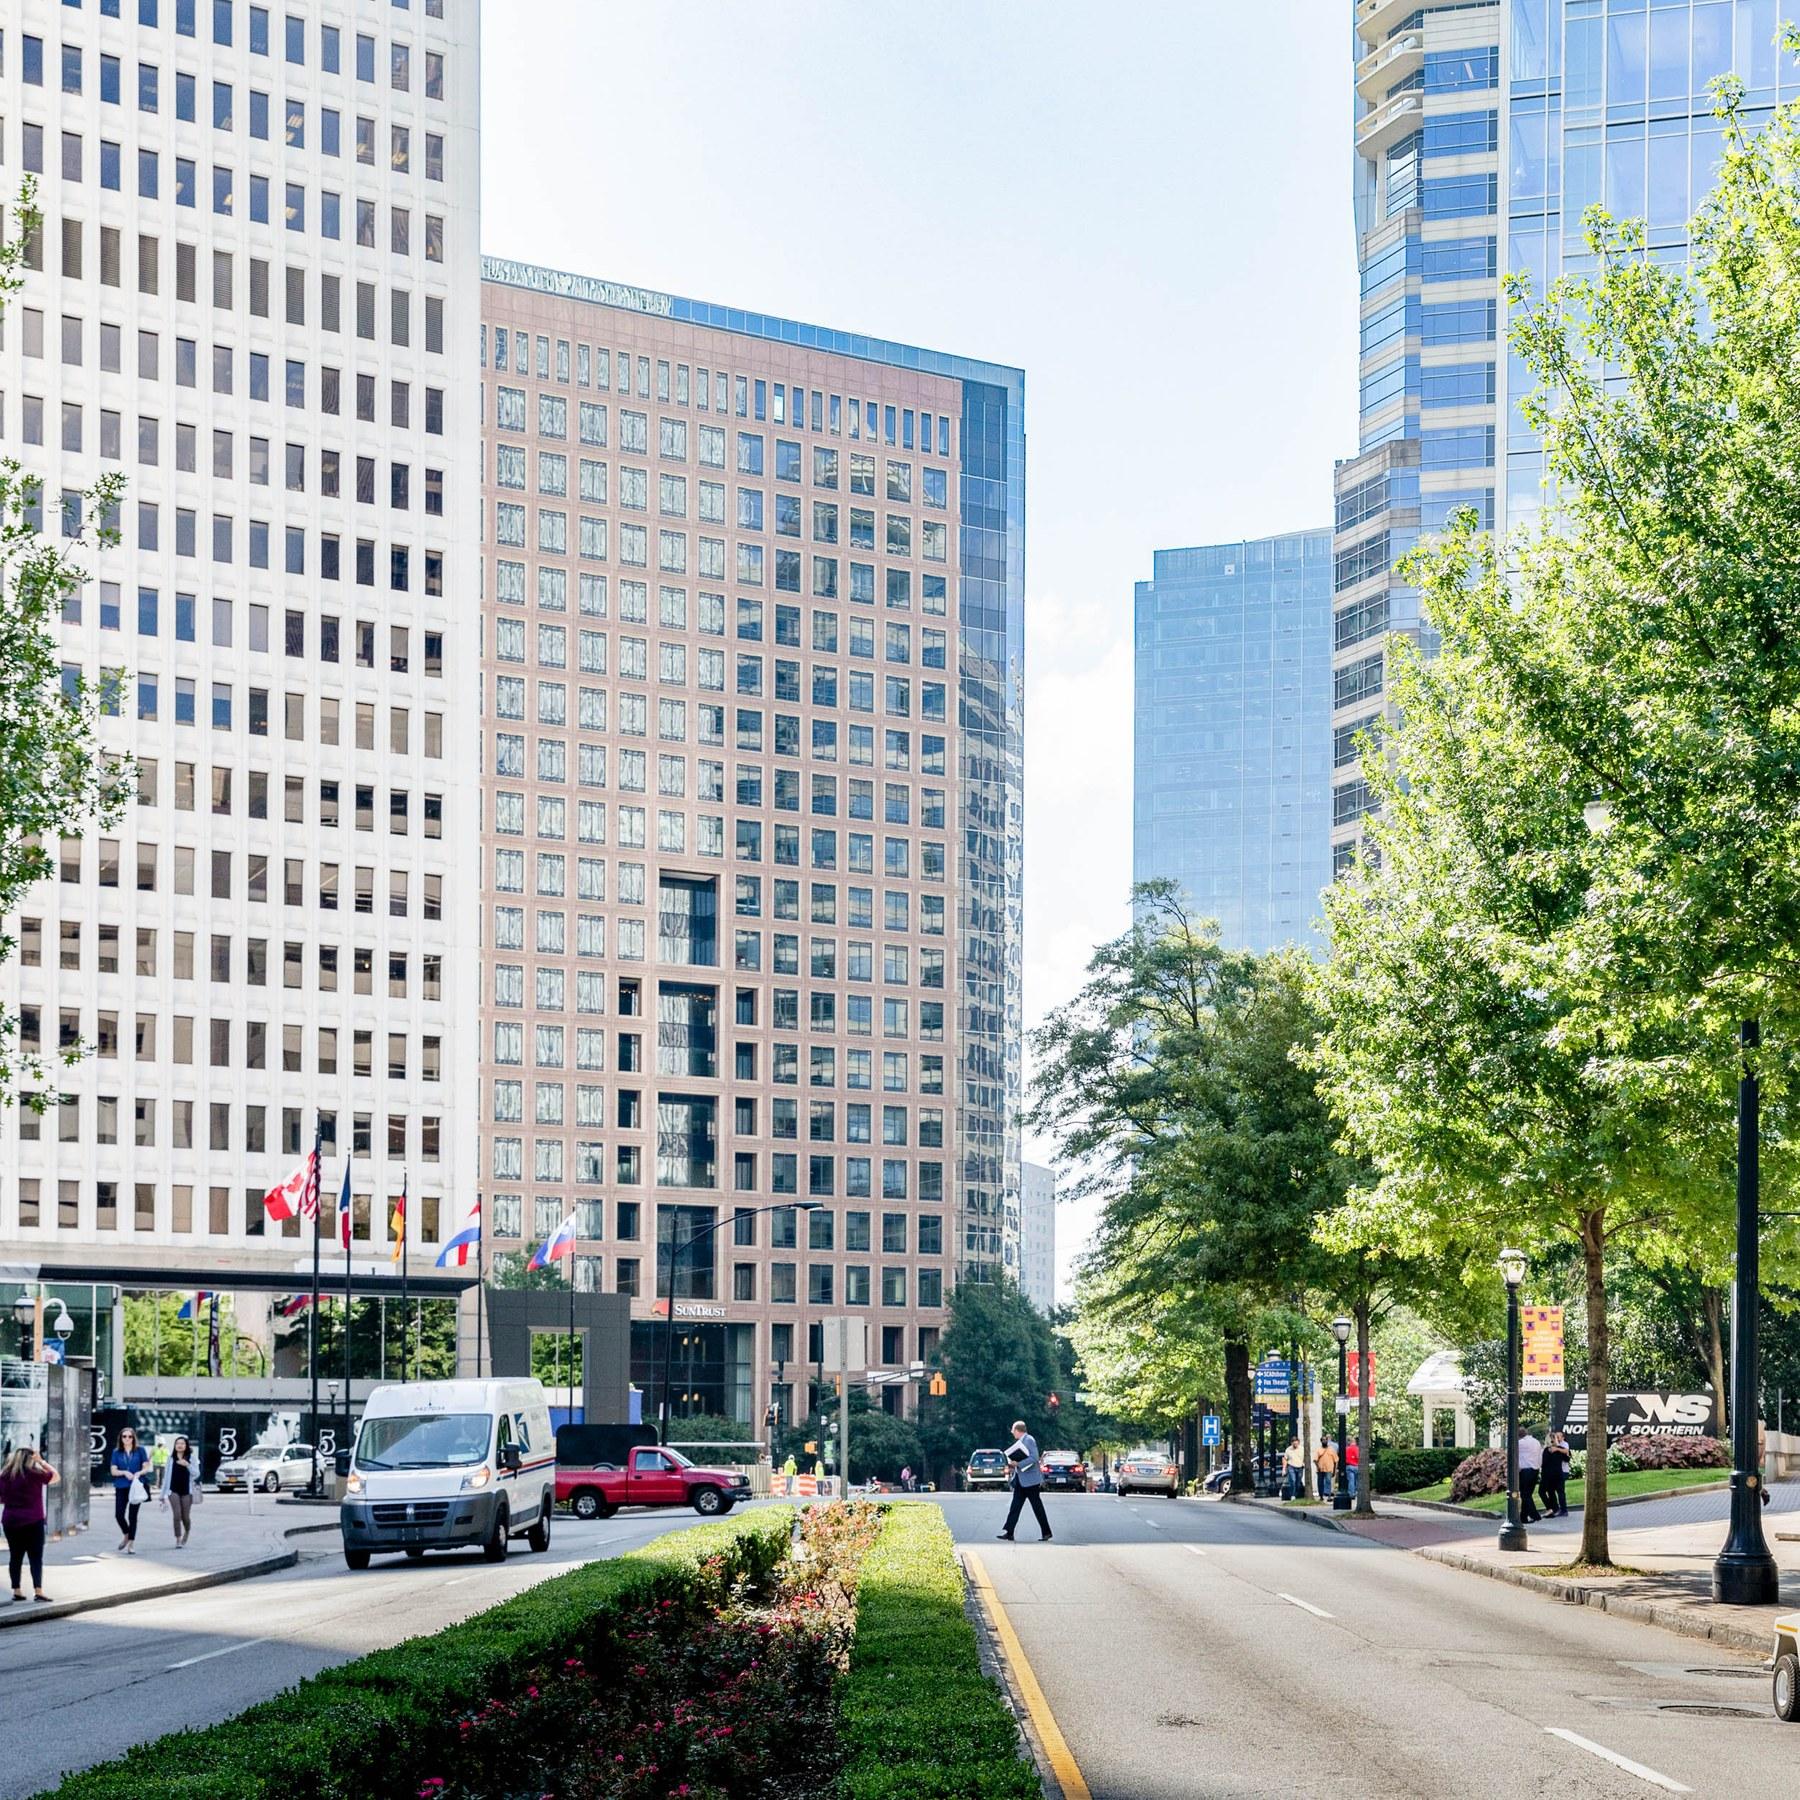 Midtown At Town Center: Midtown, Atlanta GA - Neighborhood Guide